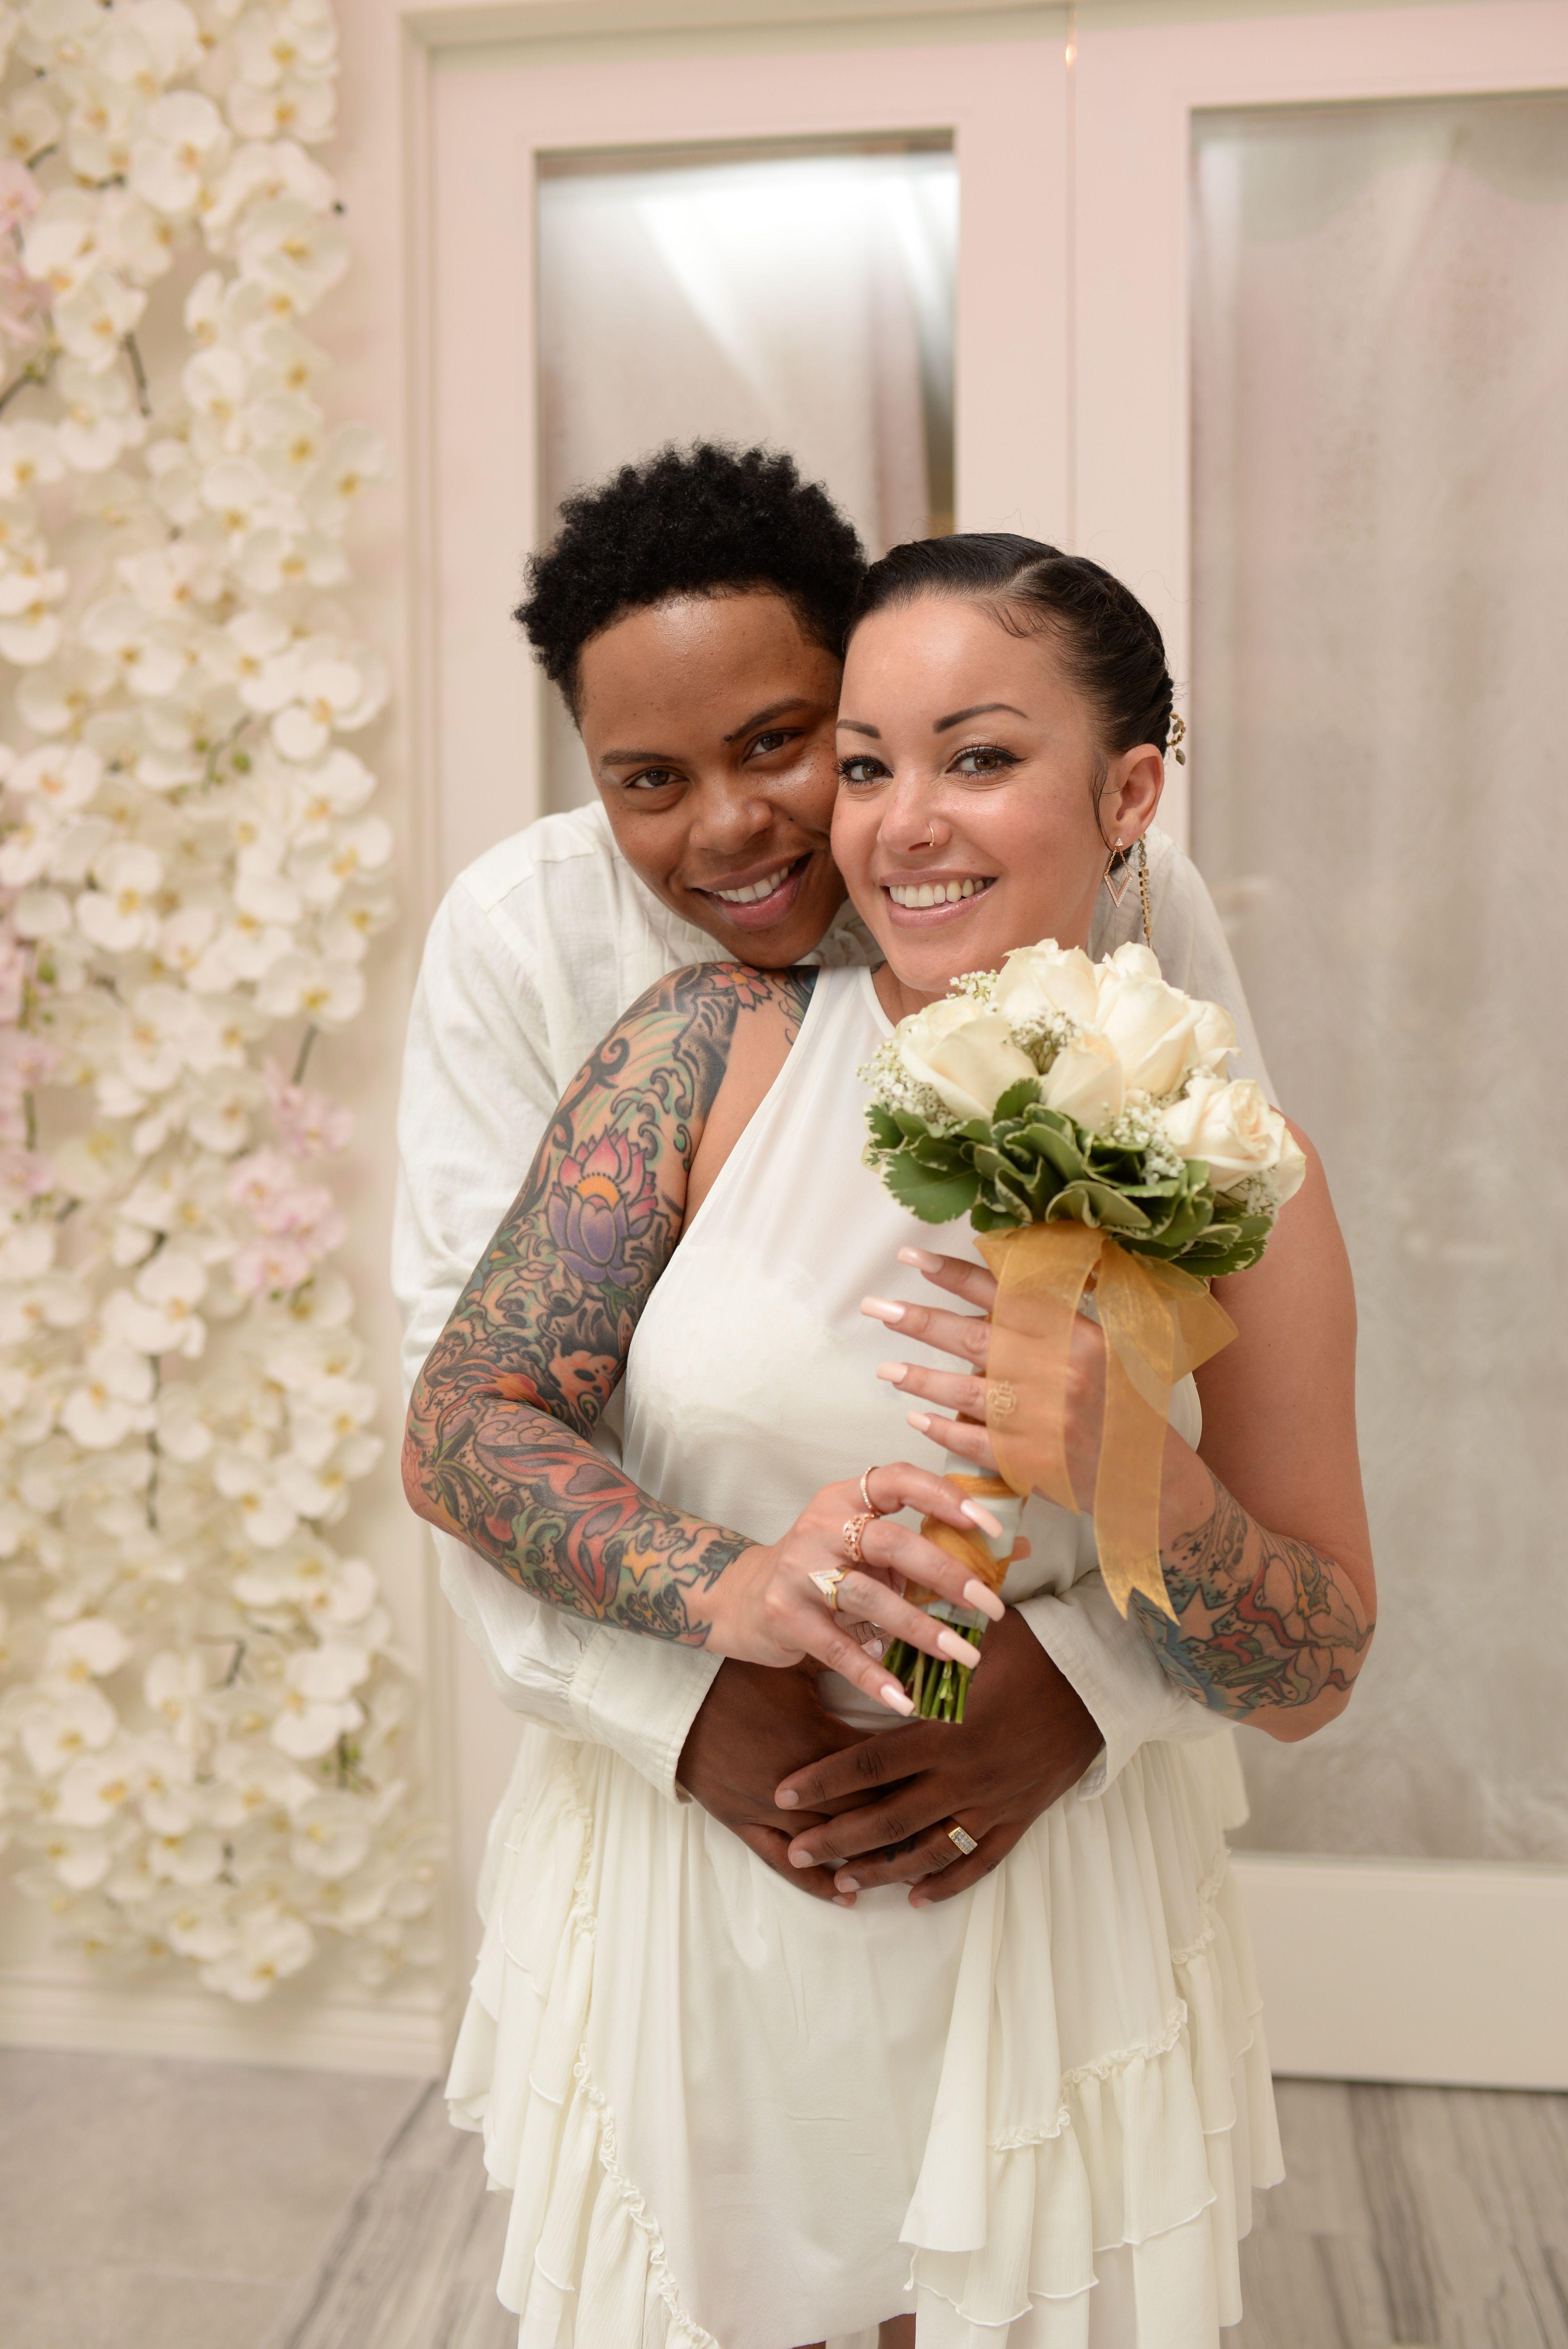 True Love At Albertson Wedding Chapel Chapel Wedding Stylish Wedding Bridesmaid Dresses